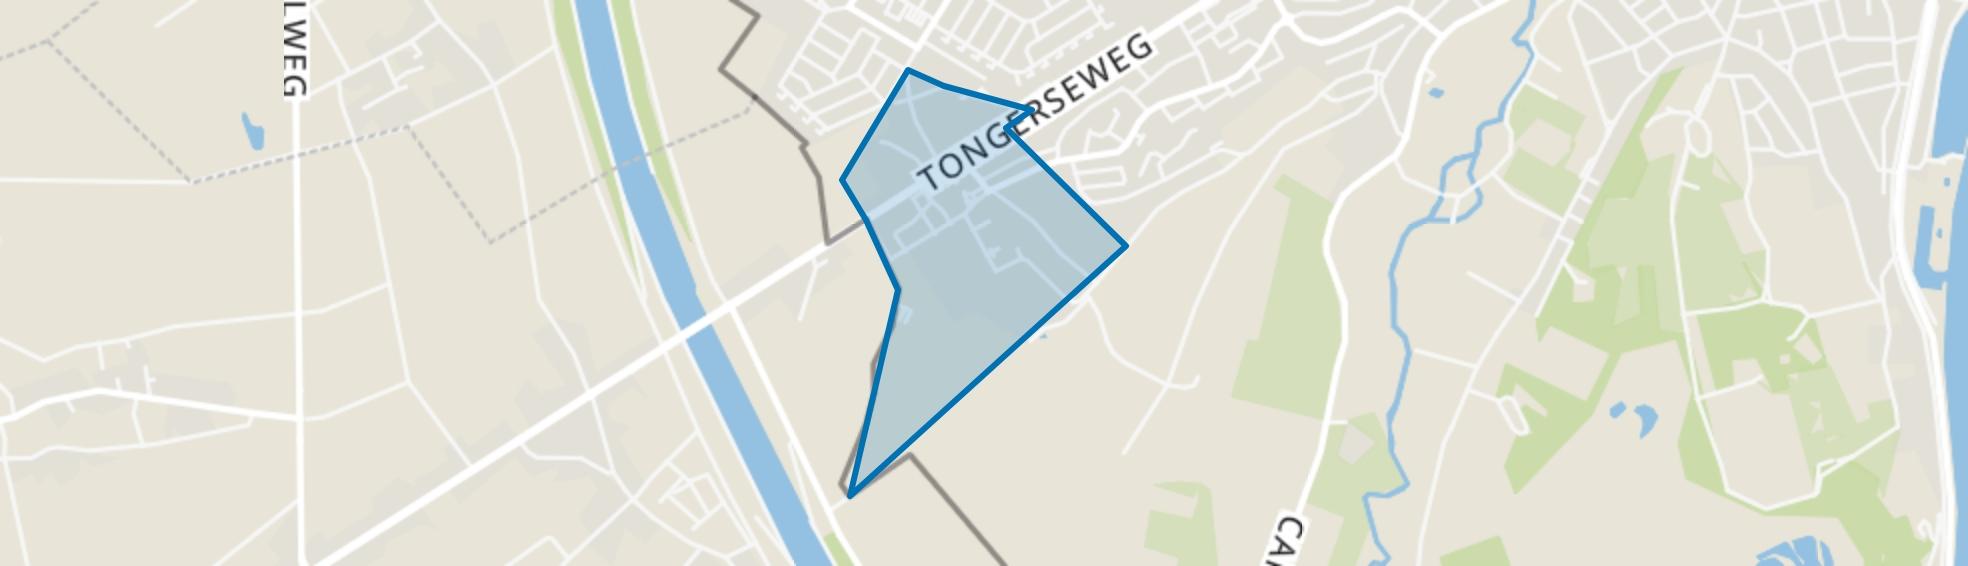 Wolder, Maastricht map